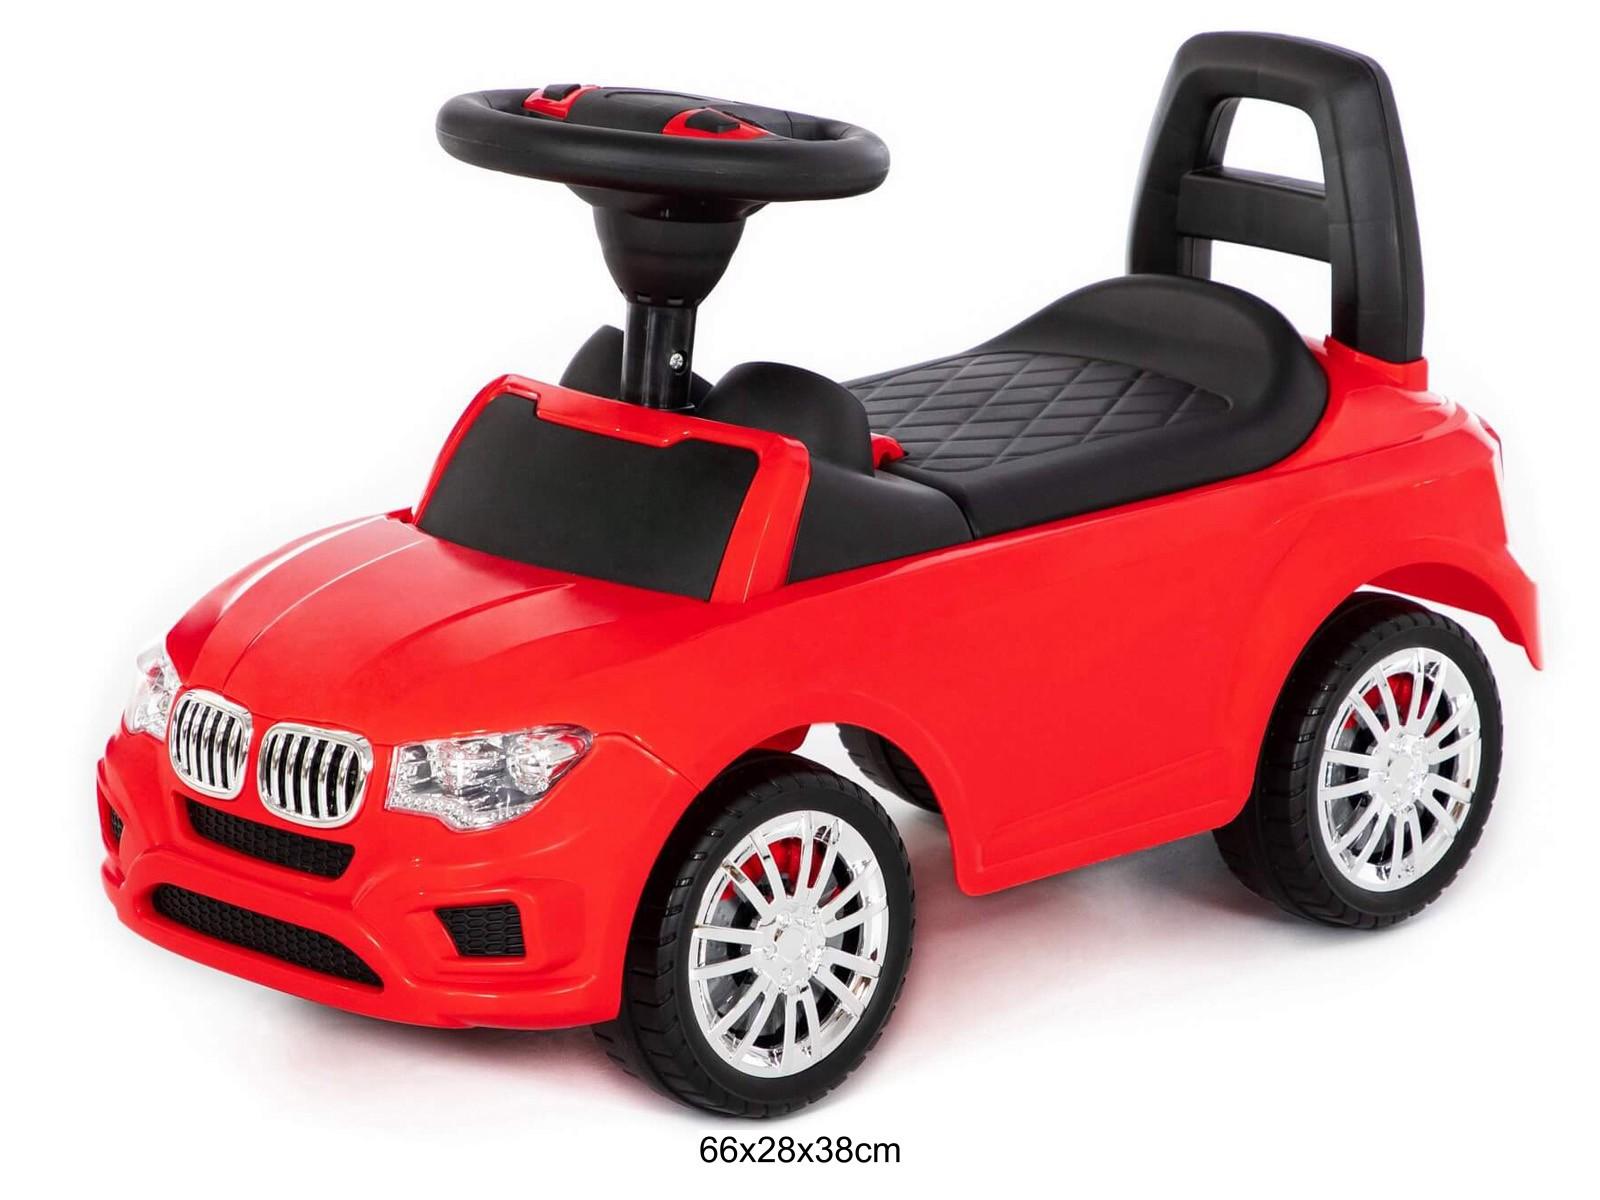 Mašīna sarkana